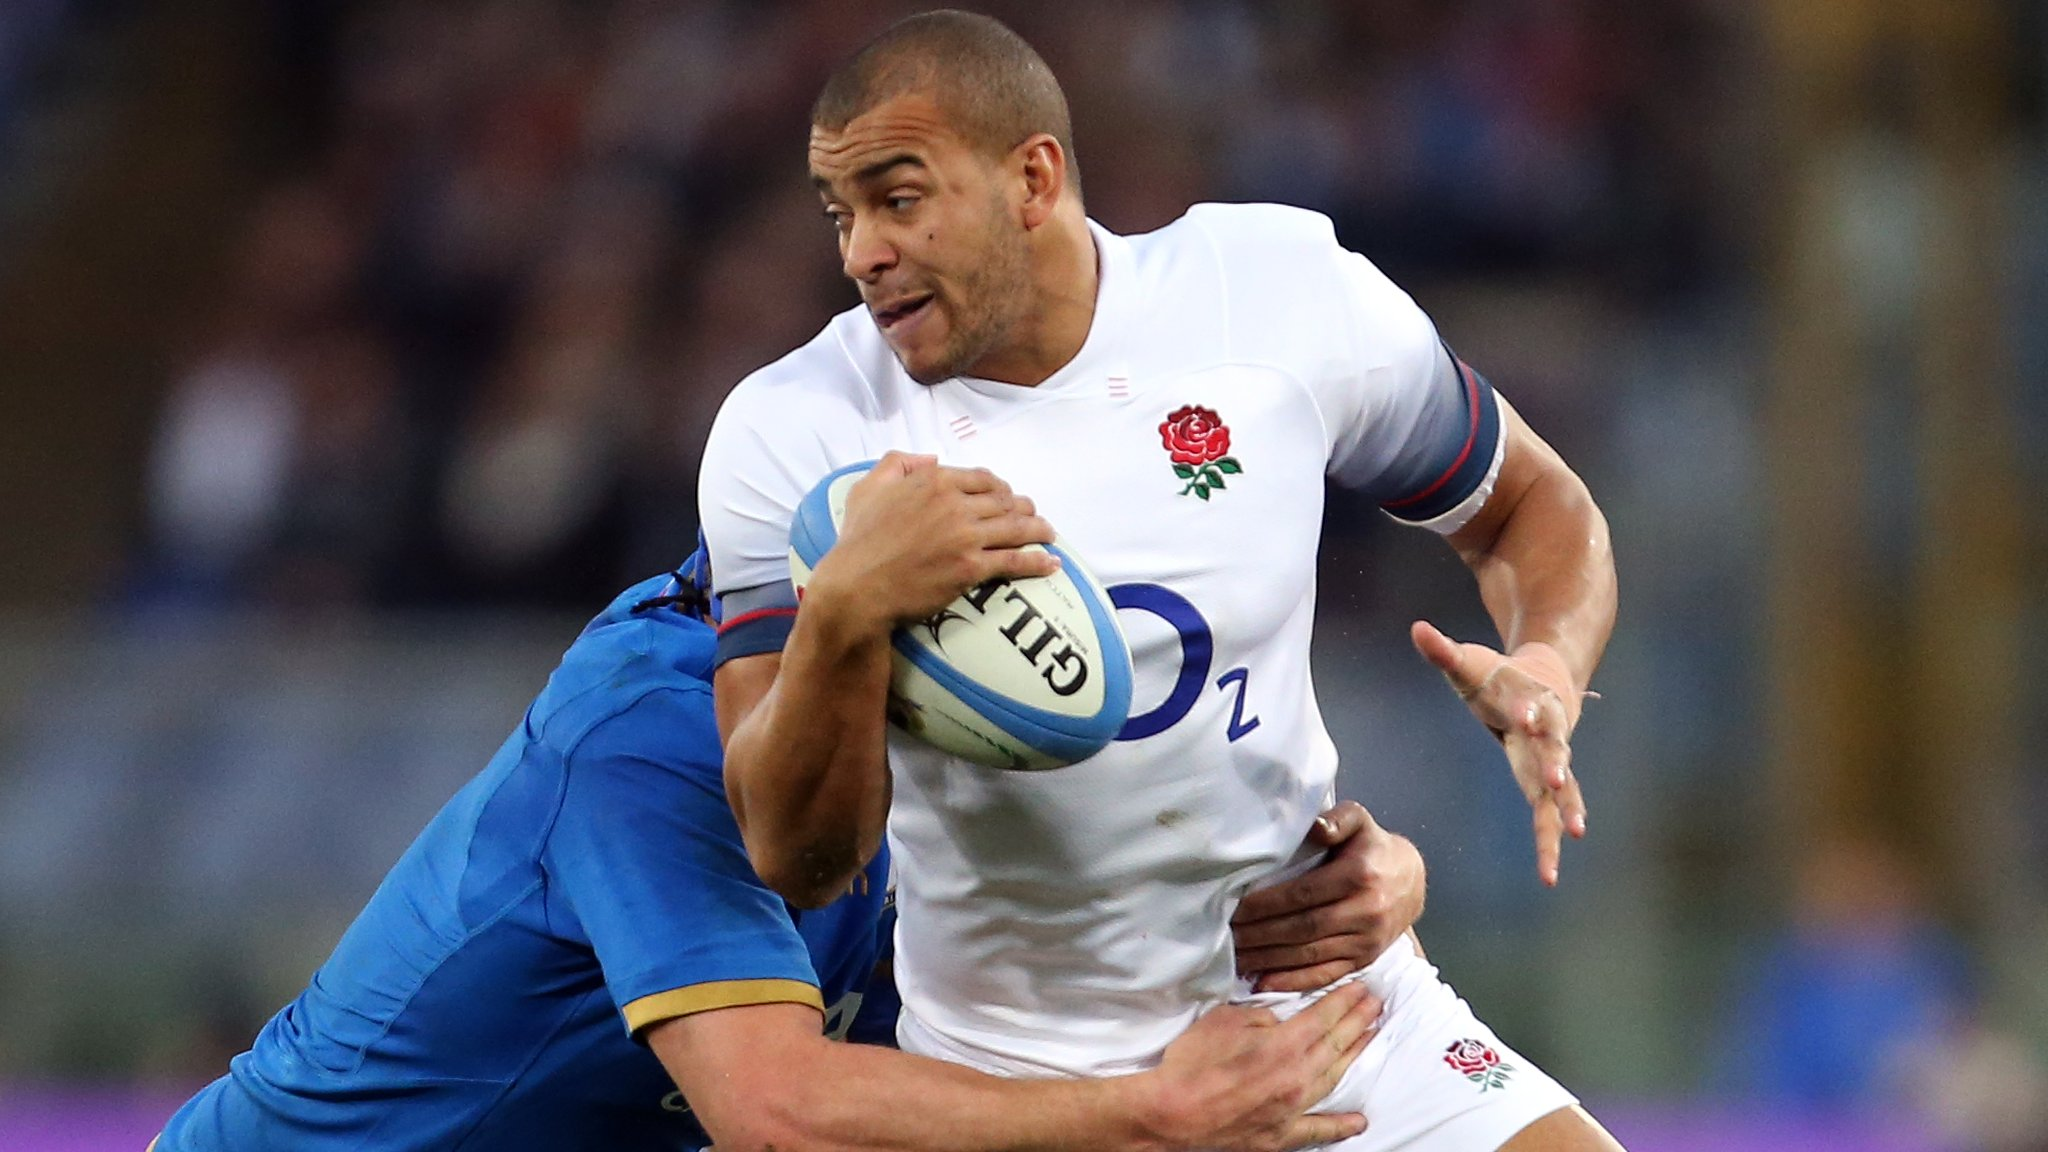 Six Nations 2019: England's Jonathan Joseph set for Bath return